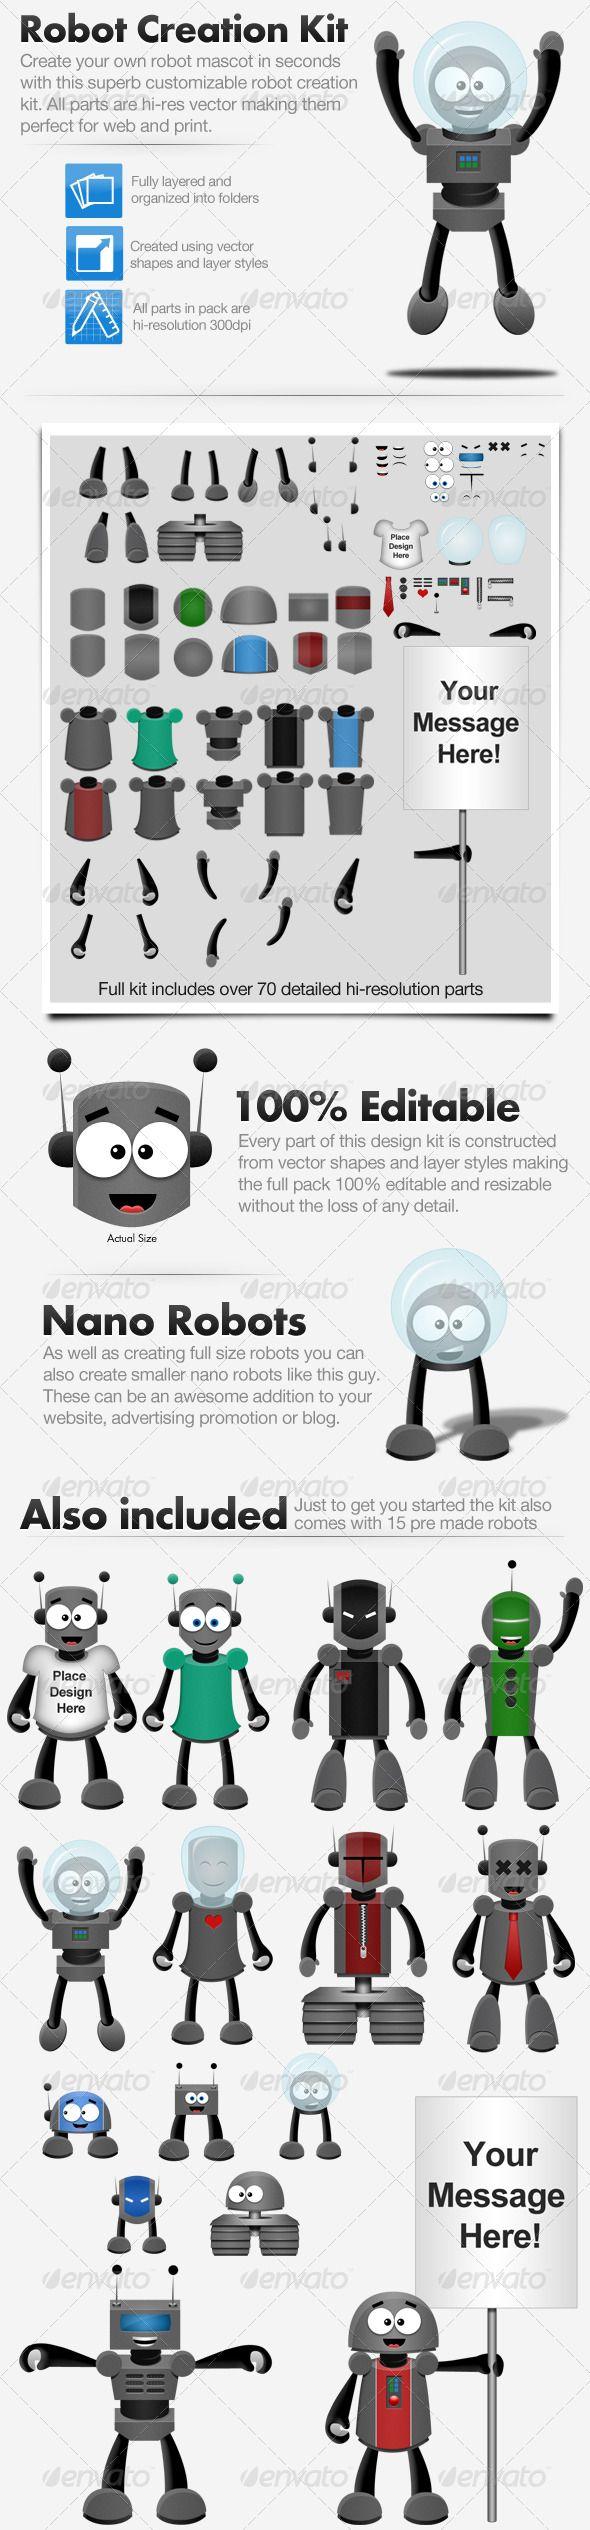 Best 25 Create Your Own Robot Ideas On Pinterest Build